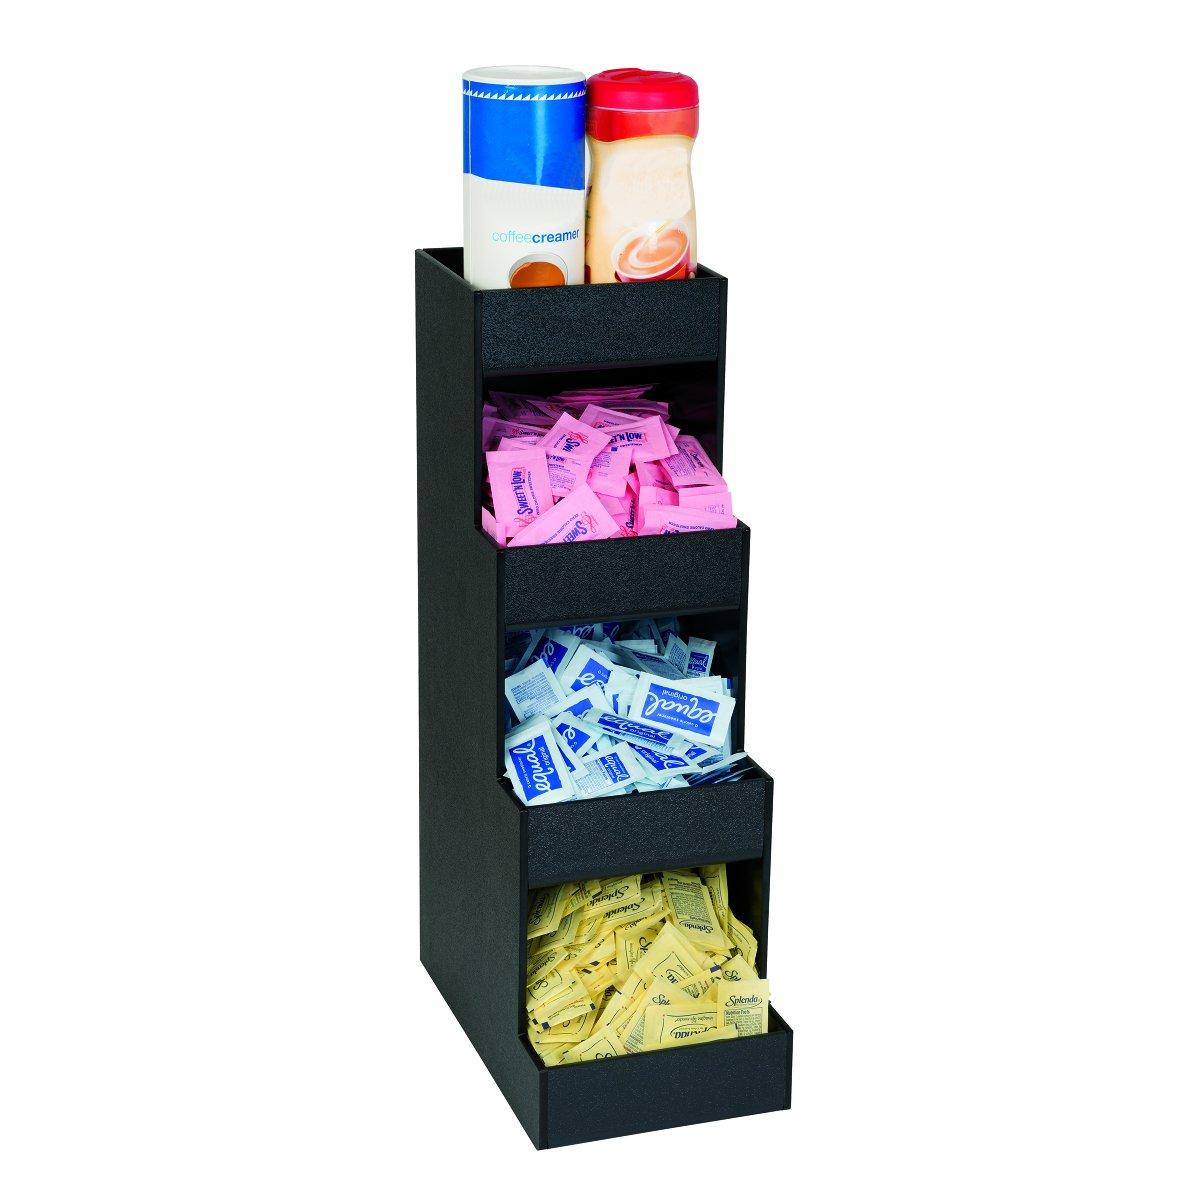 Dispense-Rite CTVH-4BT Four Section Countertop Condiment Organizer by DISPENSE-RITE (Image #1)